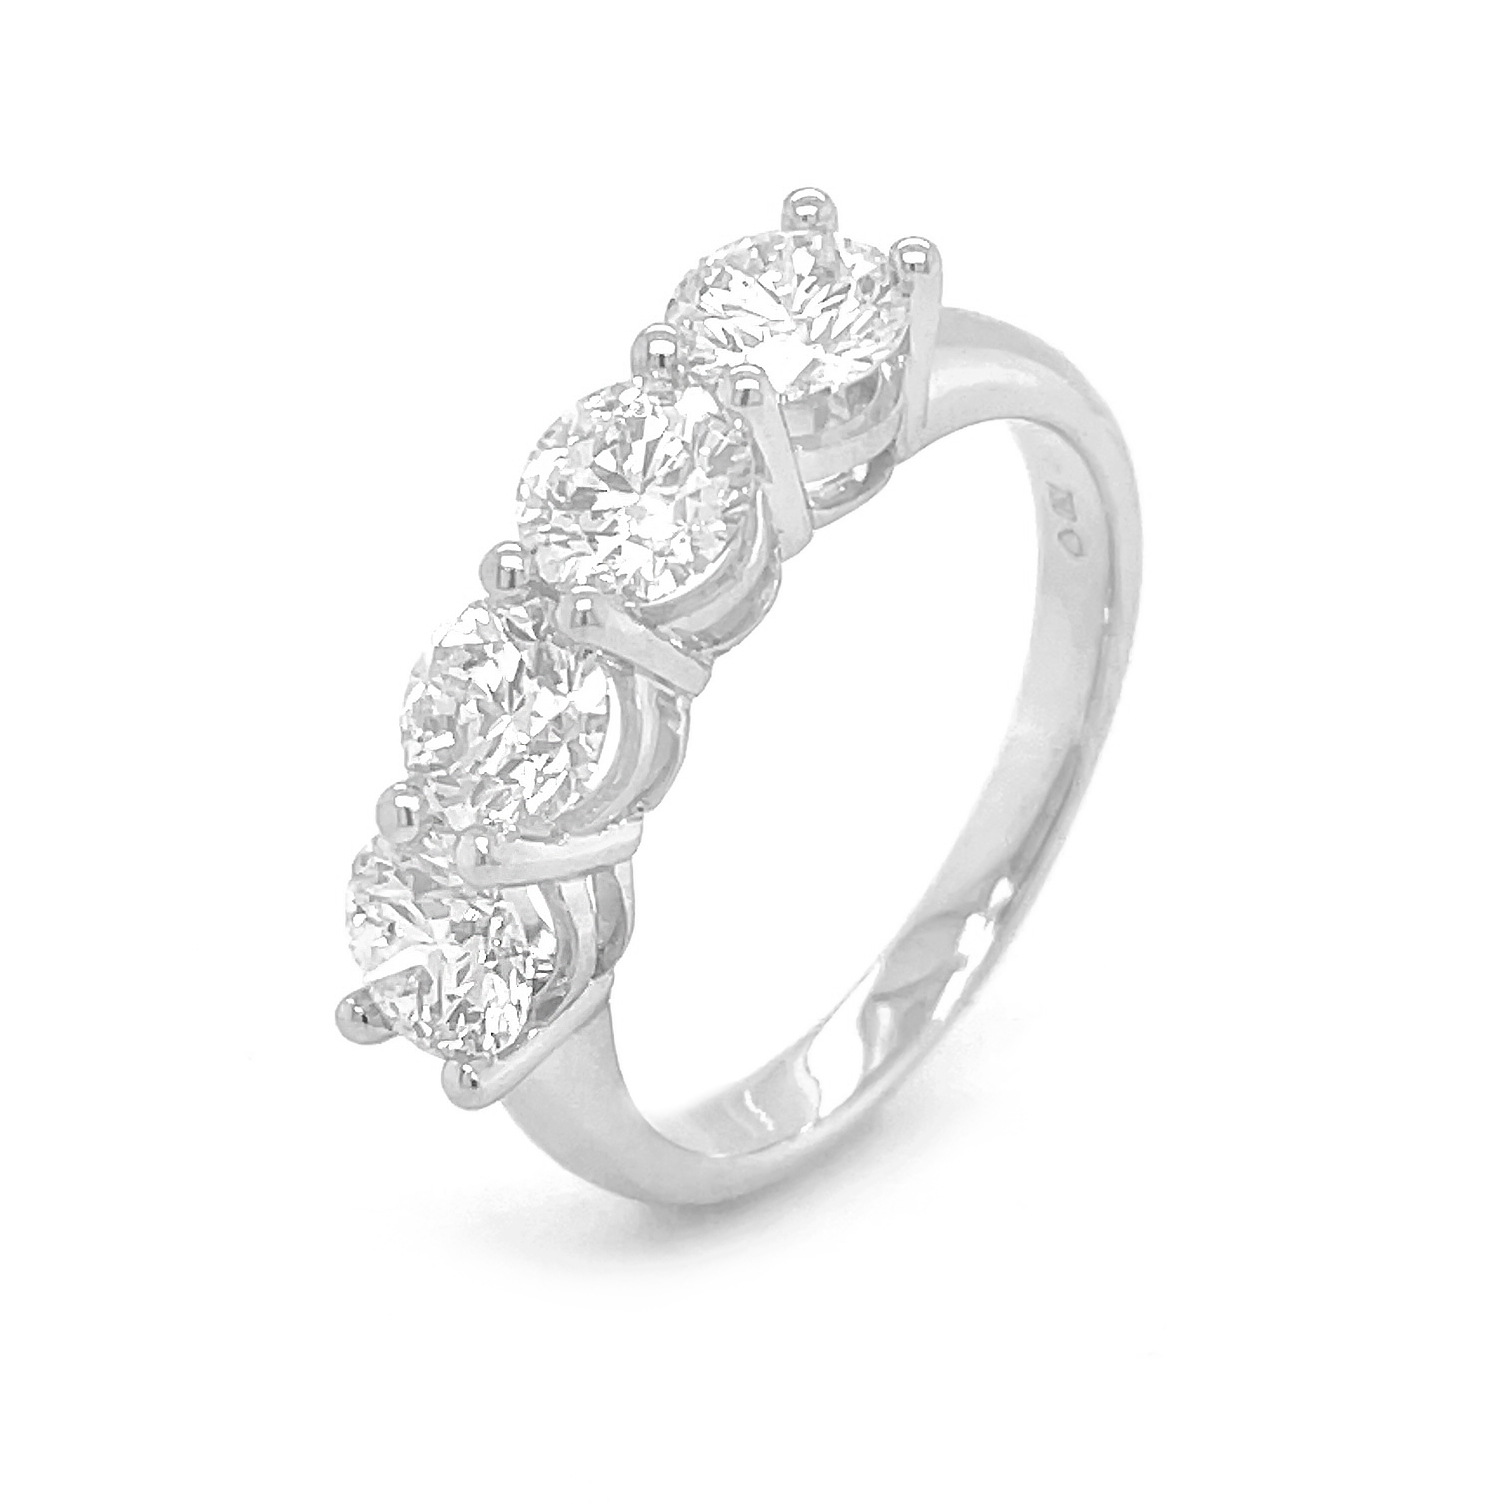 18k White Gold 4 Stone Brilliant Cut Diamond Ring